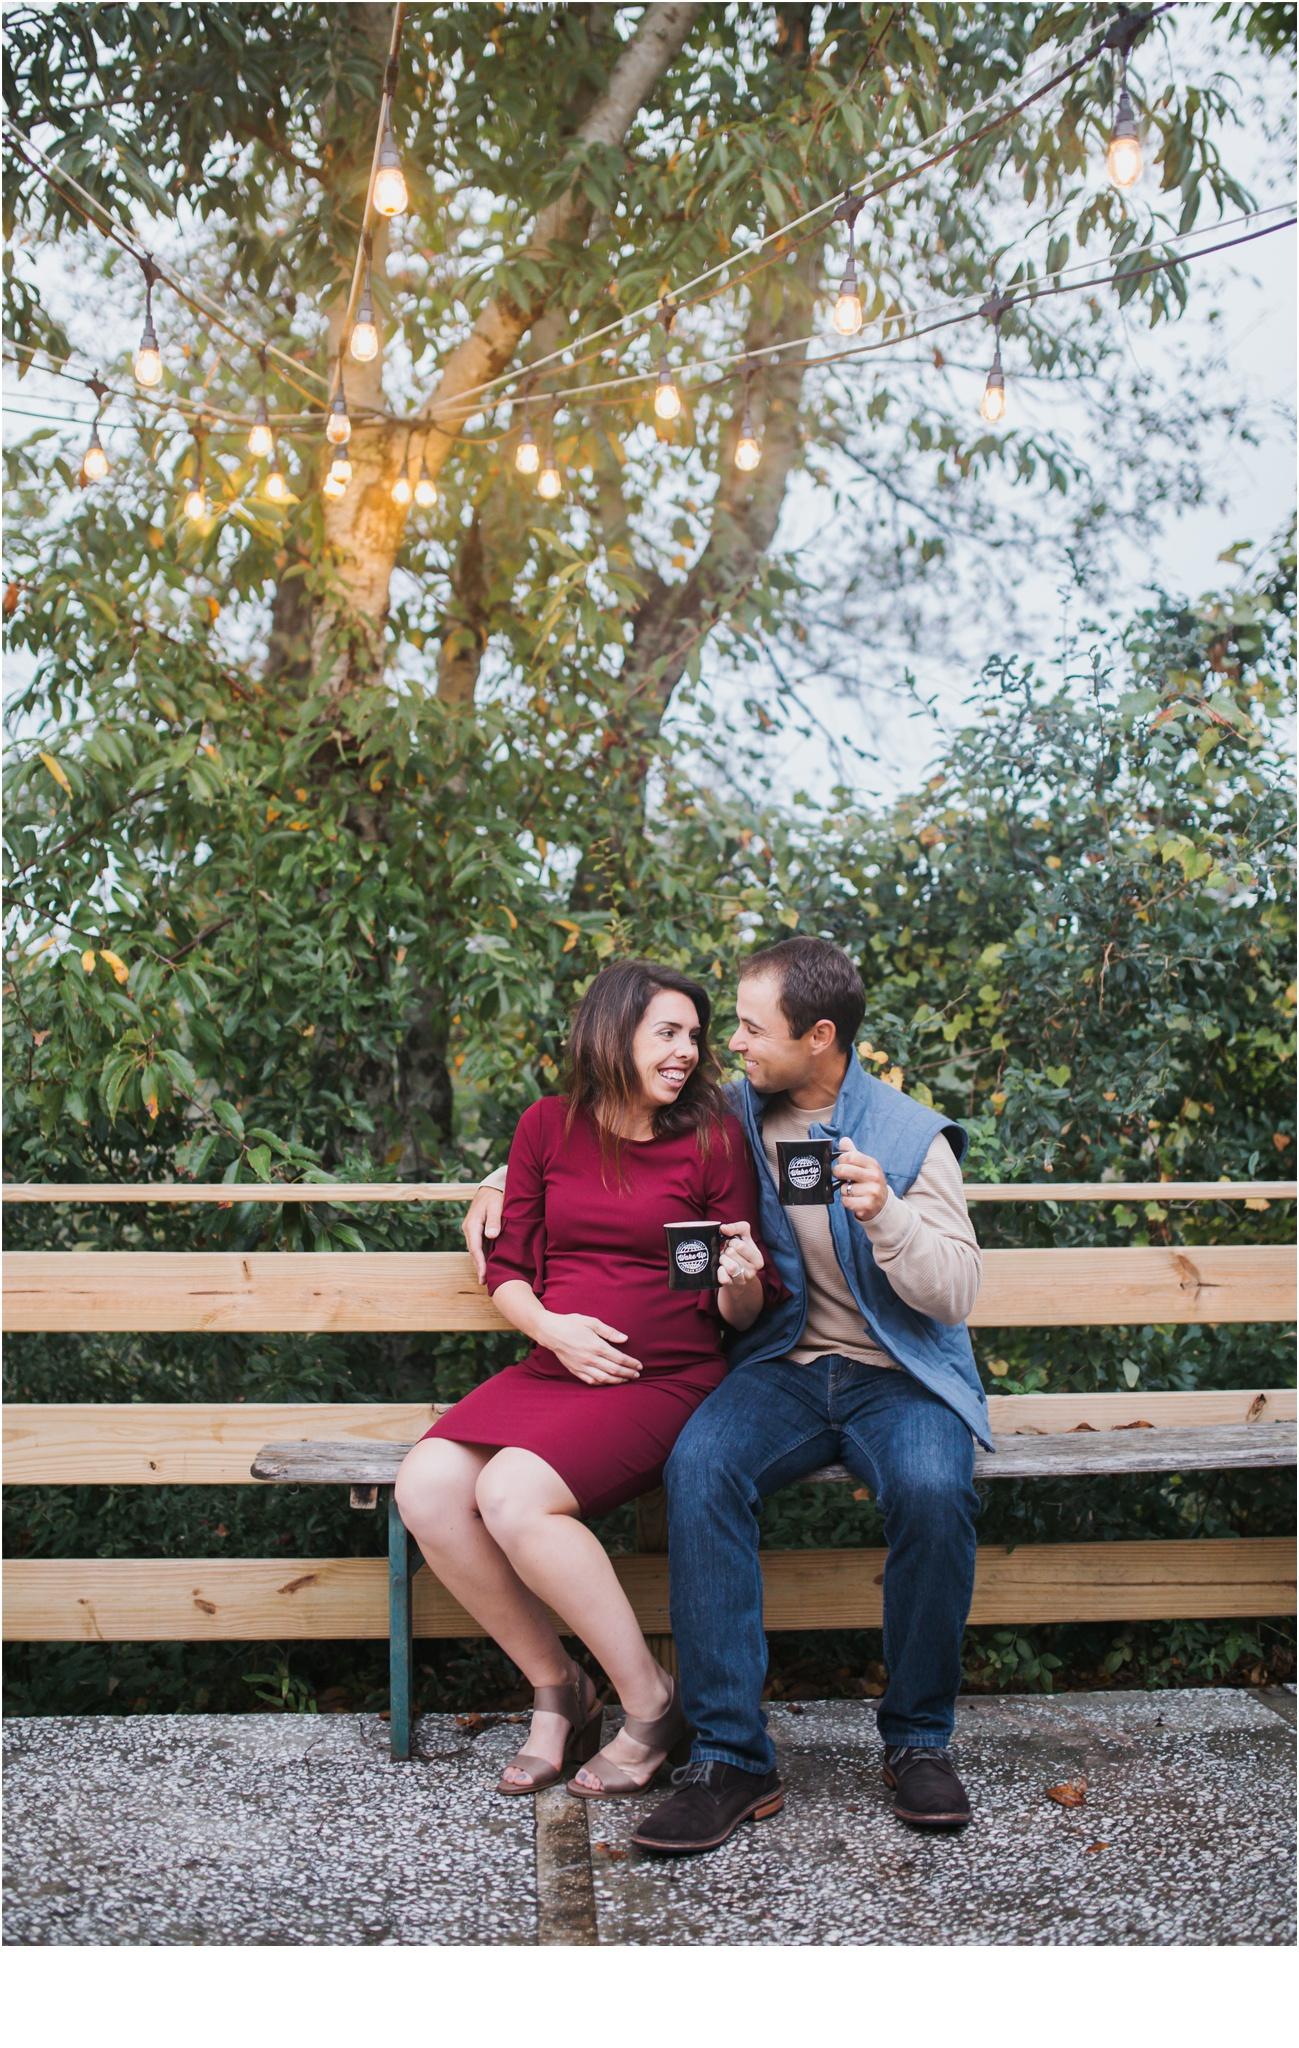 Rainey_Gregg_Photography_St._Simons_Island_Georgia_California_Wedding_Portrait_Photography_1235.jpg